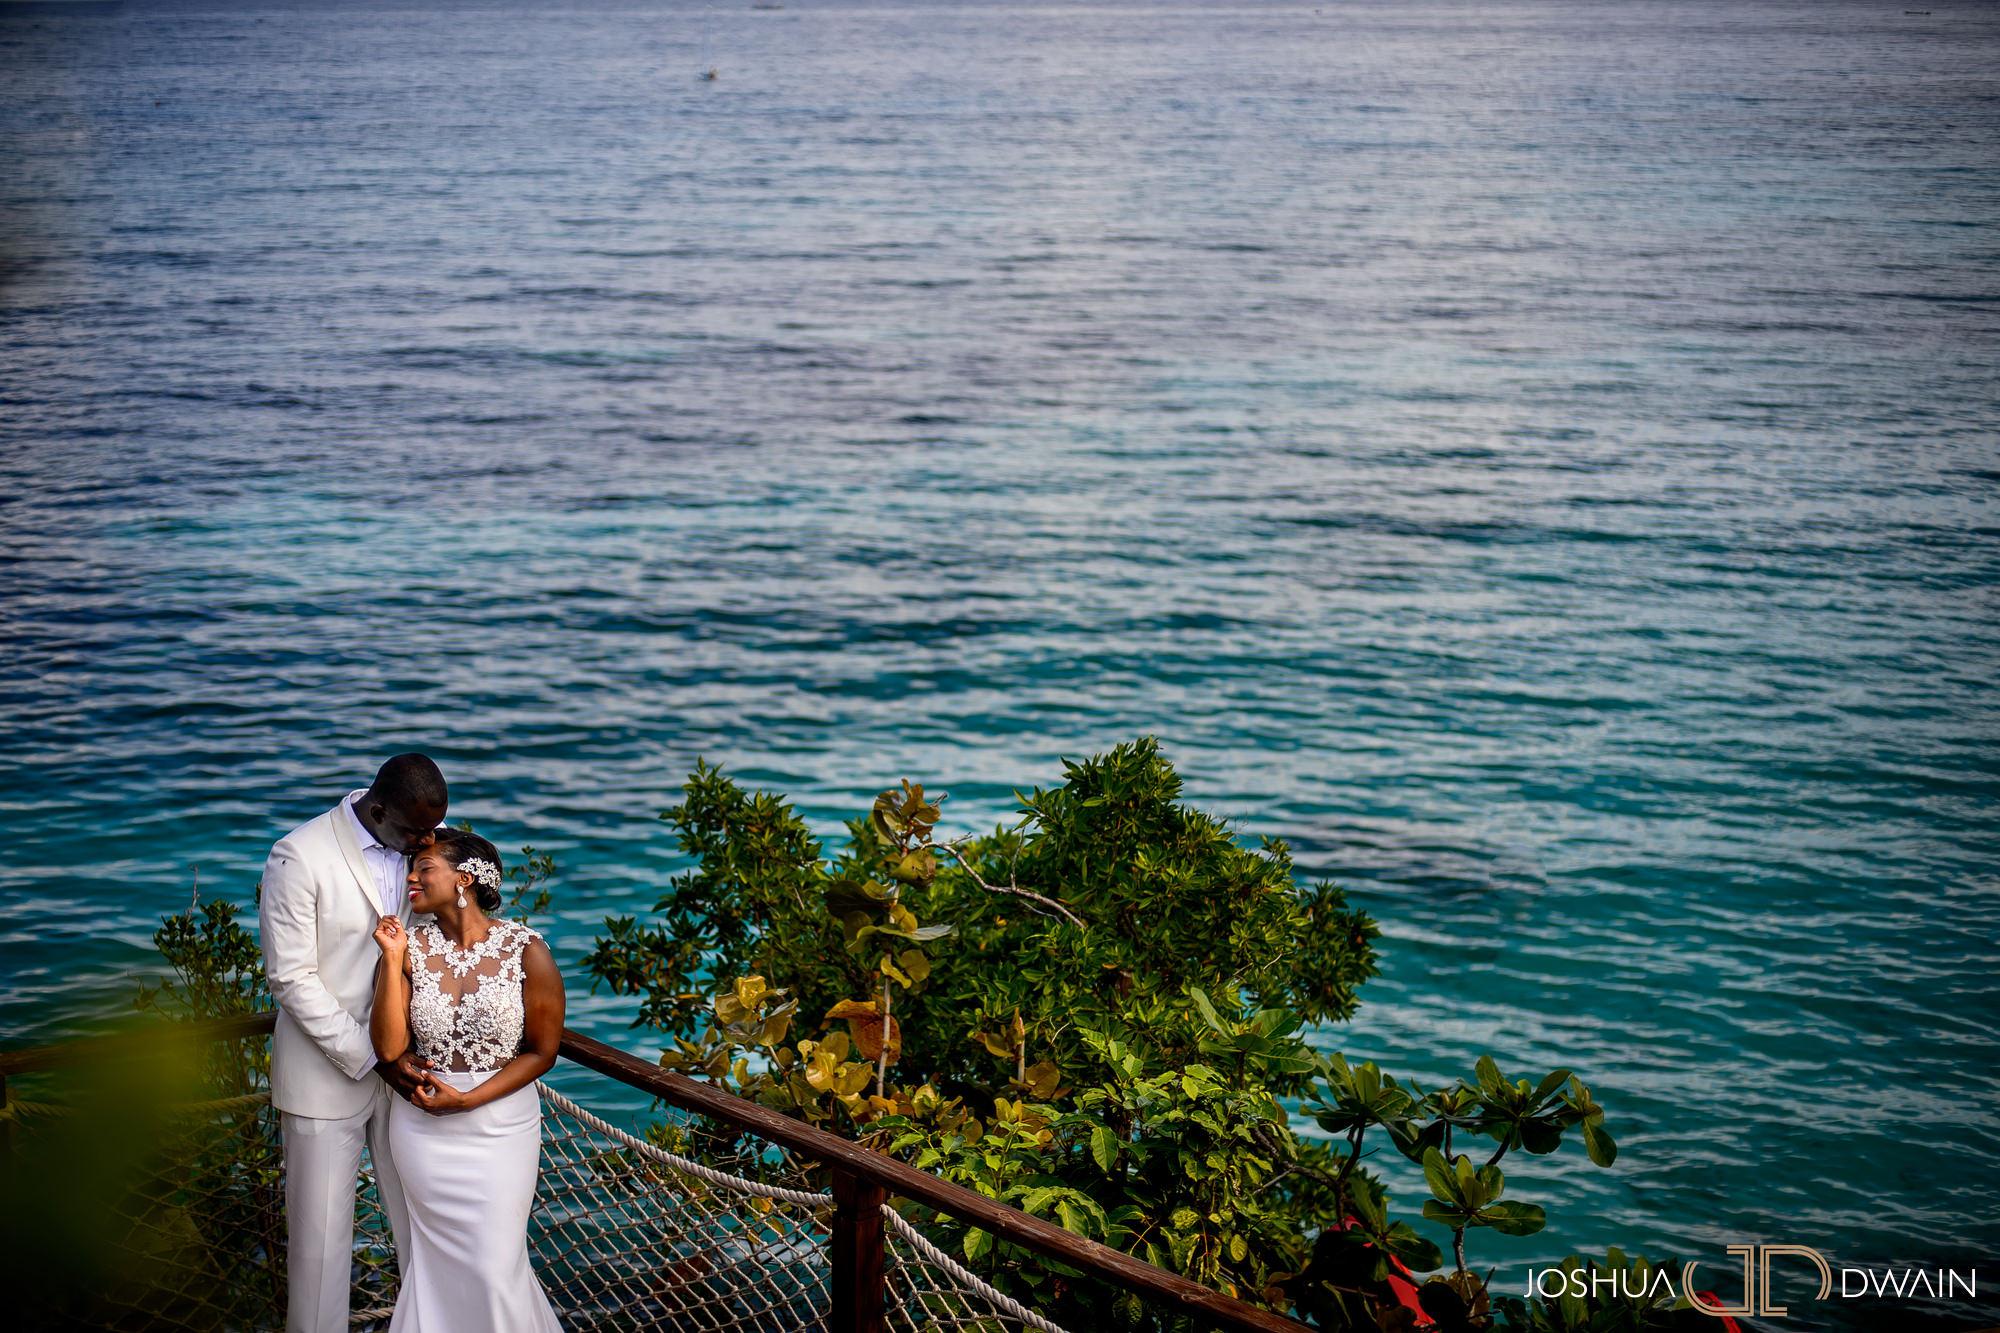 joshua-dwain-weddings-gallery-best-wedding-photographers-us-013